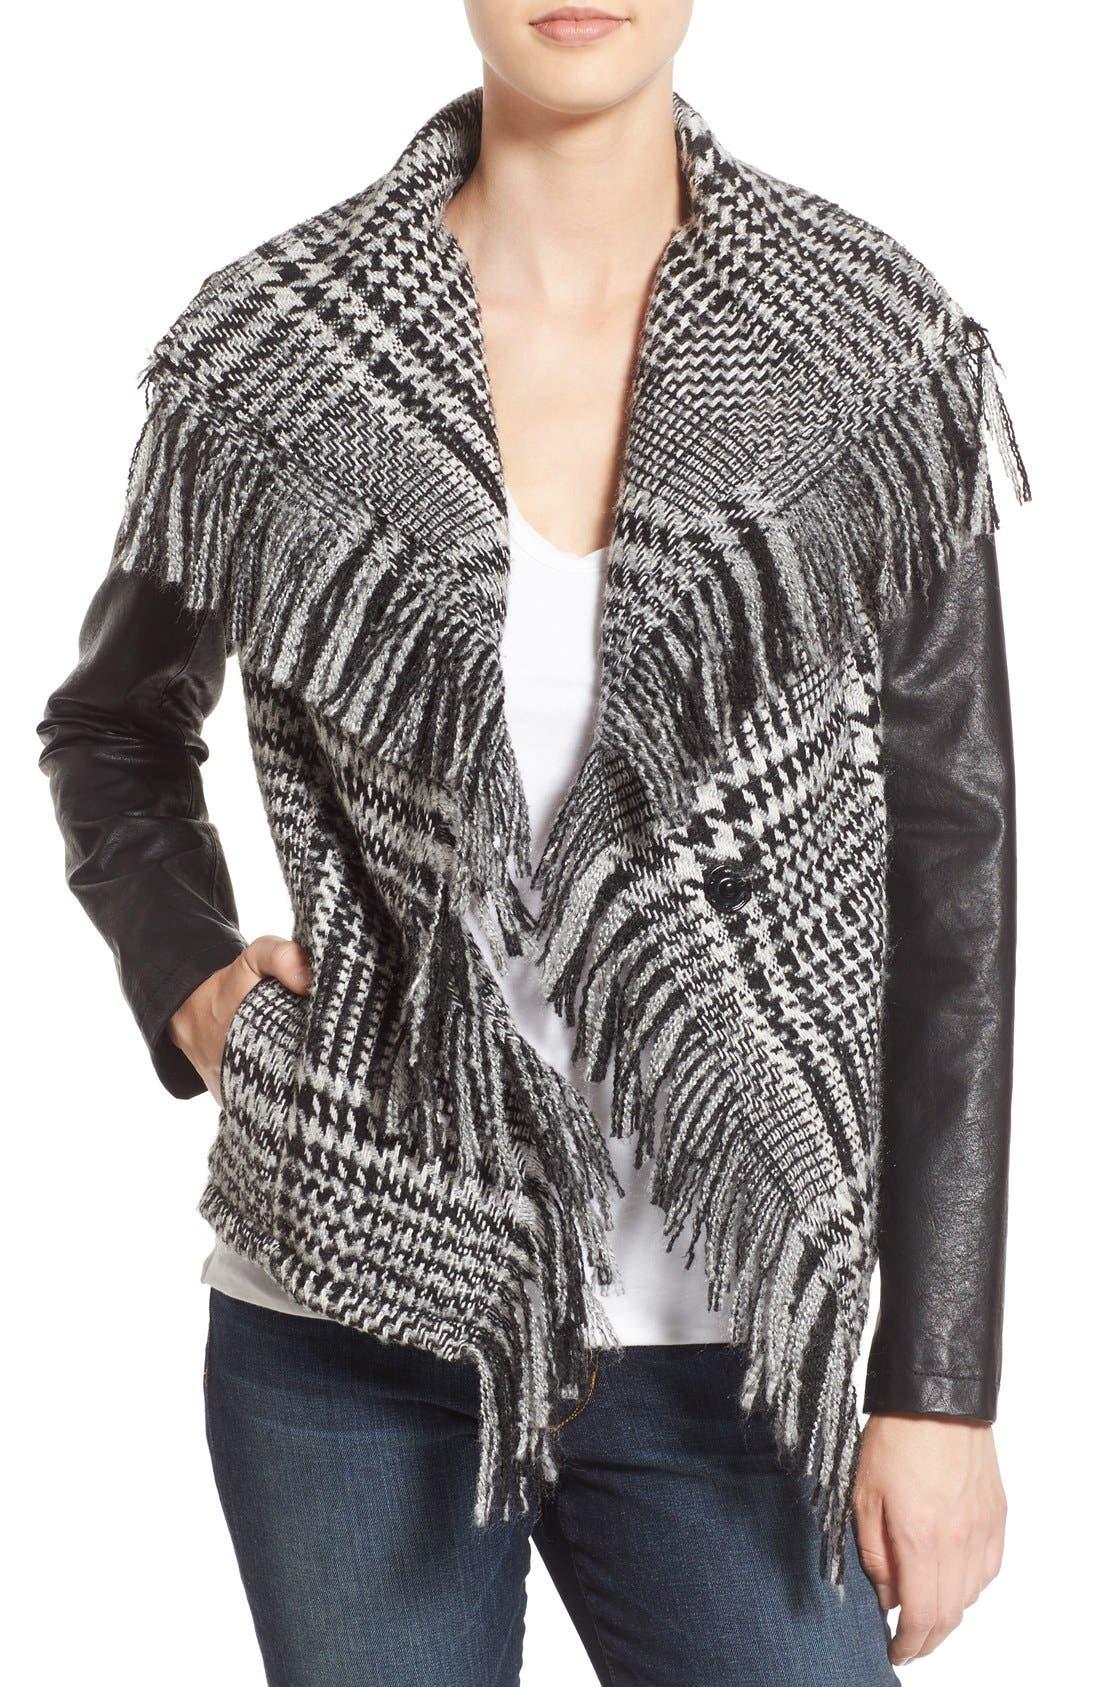 Fringe Trim Glen Plaid Faux Leather Moto Jacket,                             Main thumbnail 1, color,                             Black/ White Plaid